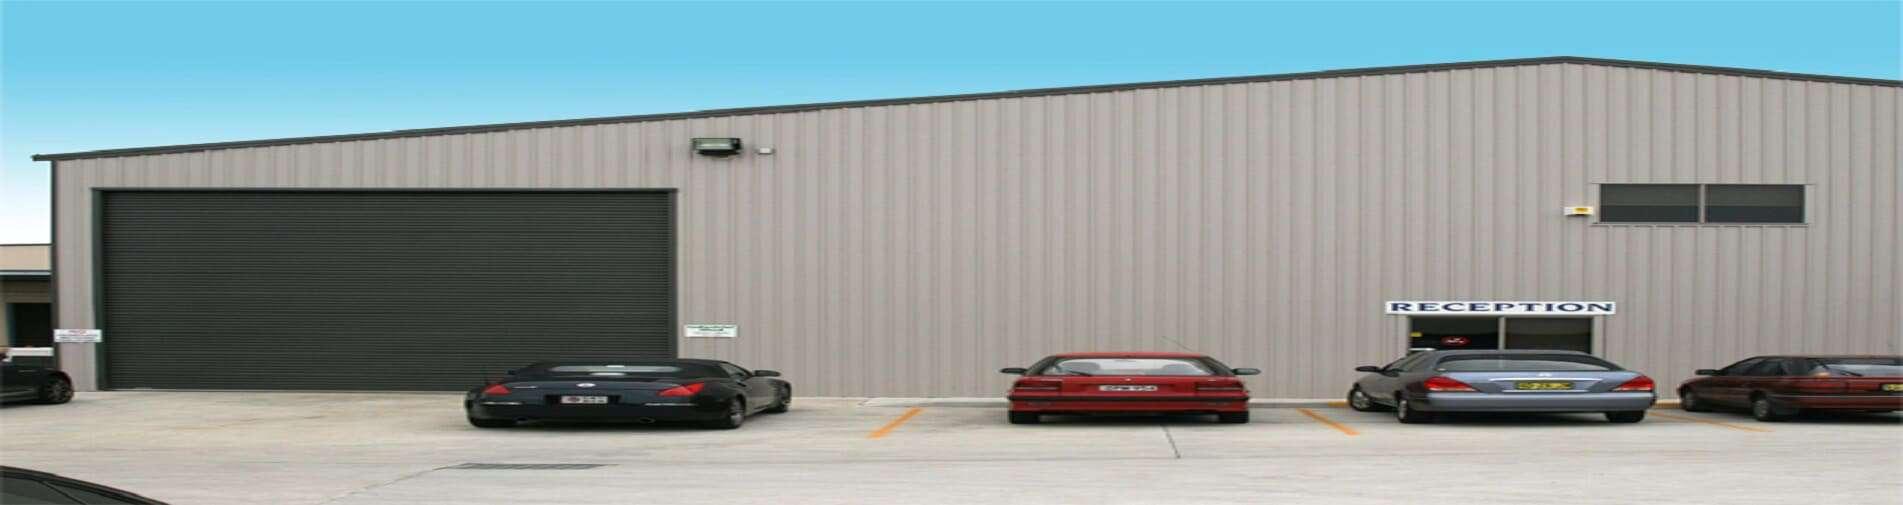 industrial-sheds-10